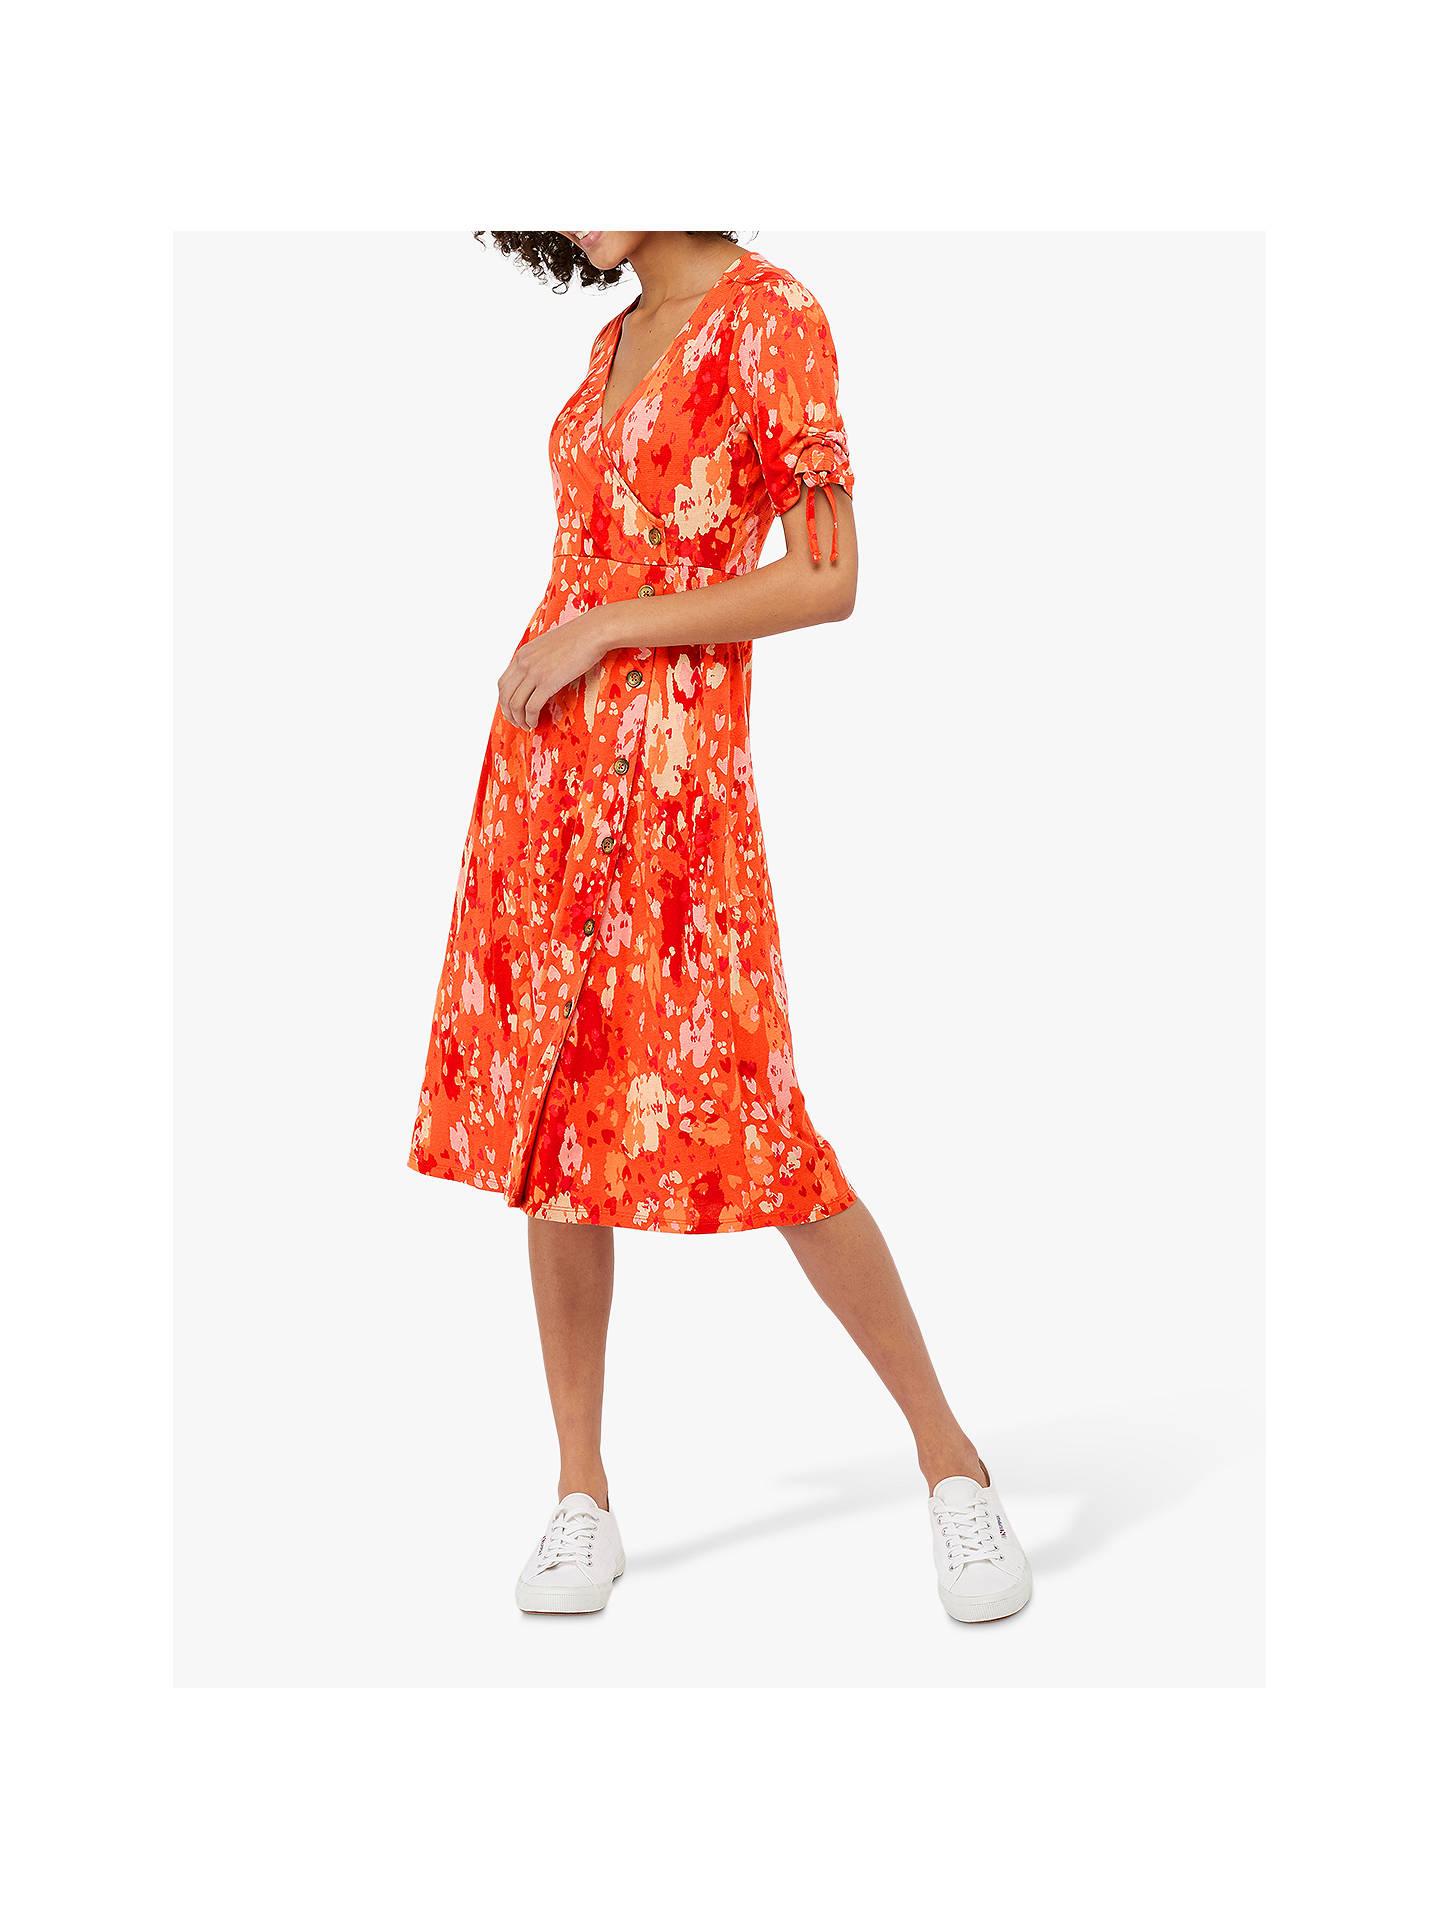 b57a48b41698 Buy Monsoon Nigela Jersey Print Midi Dress, Red/Multi, 8 Online at  johnlewis ...